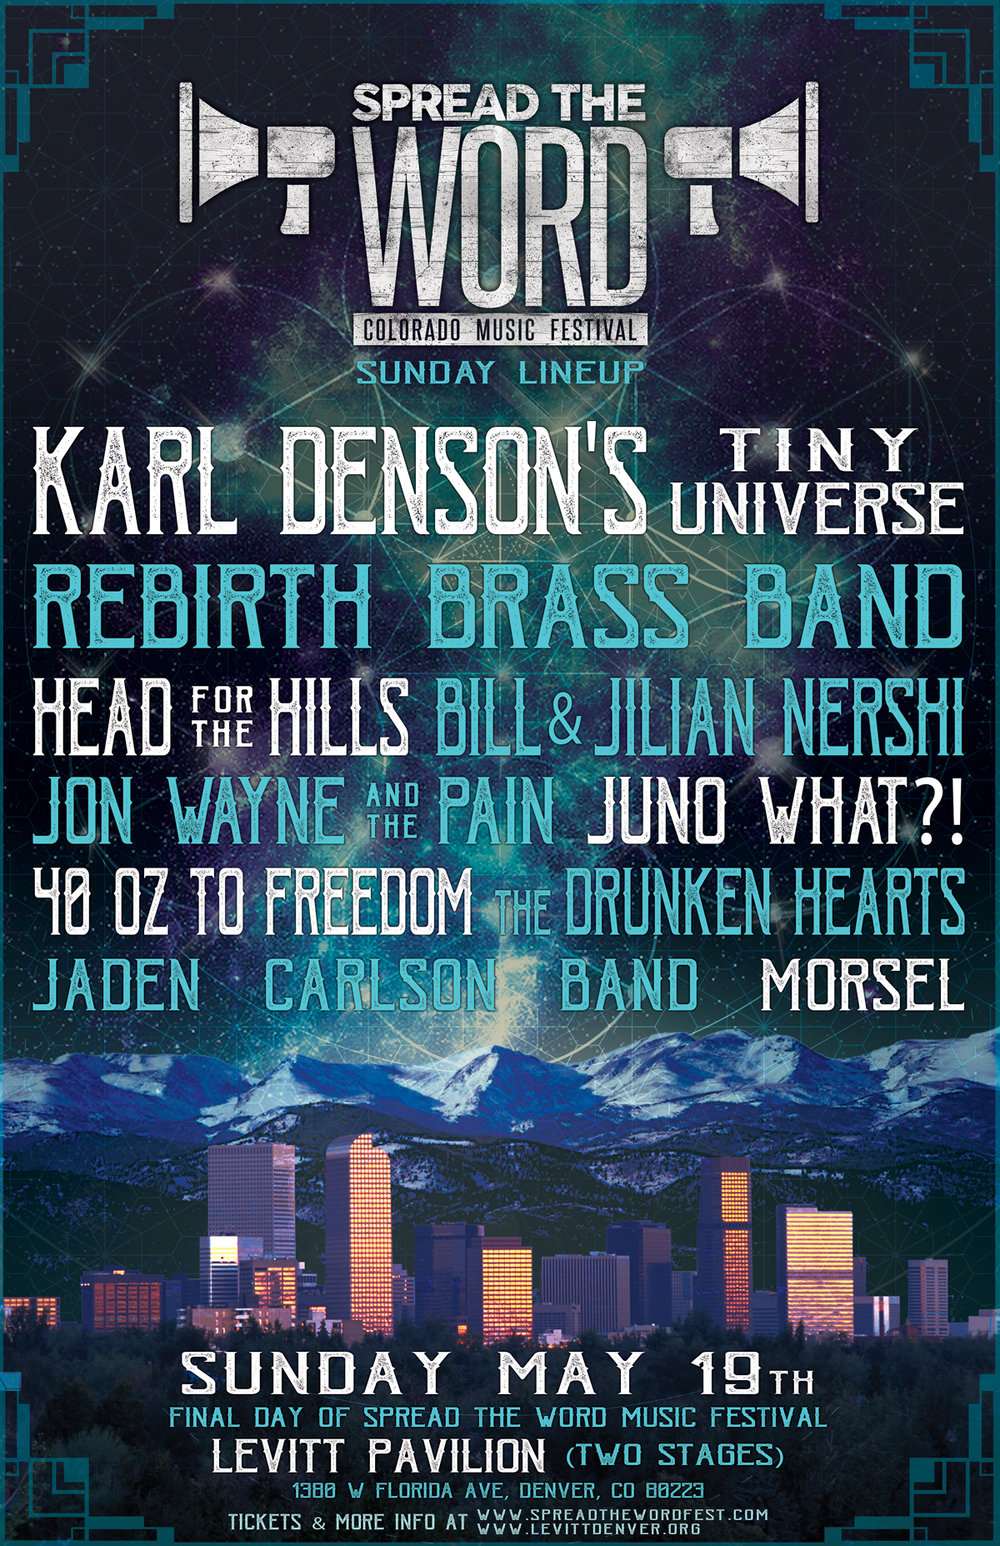 Spread The Word Colorado Music Festival